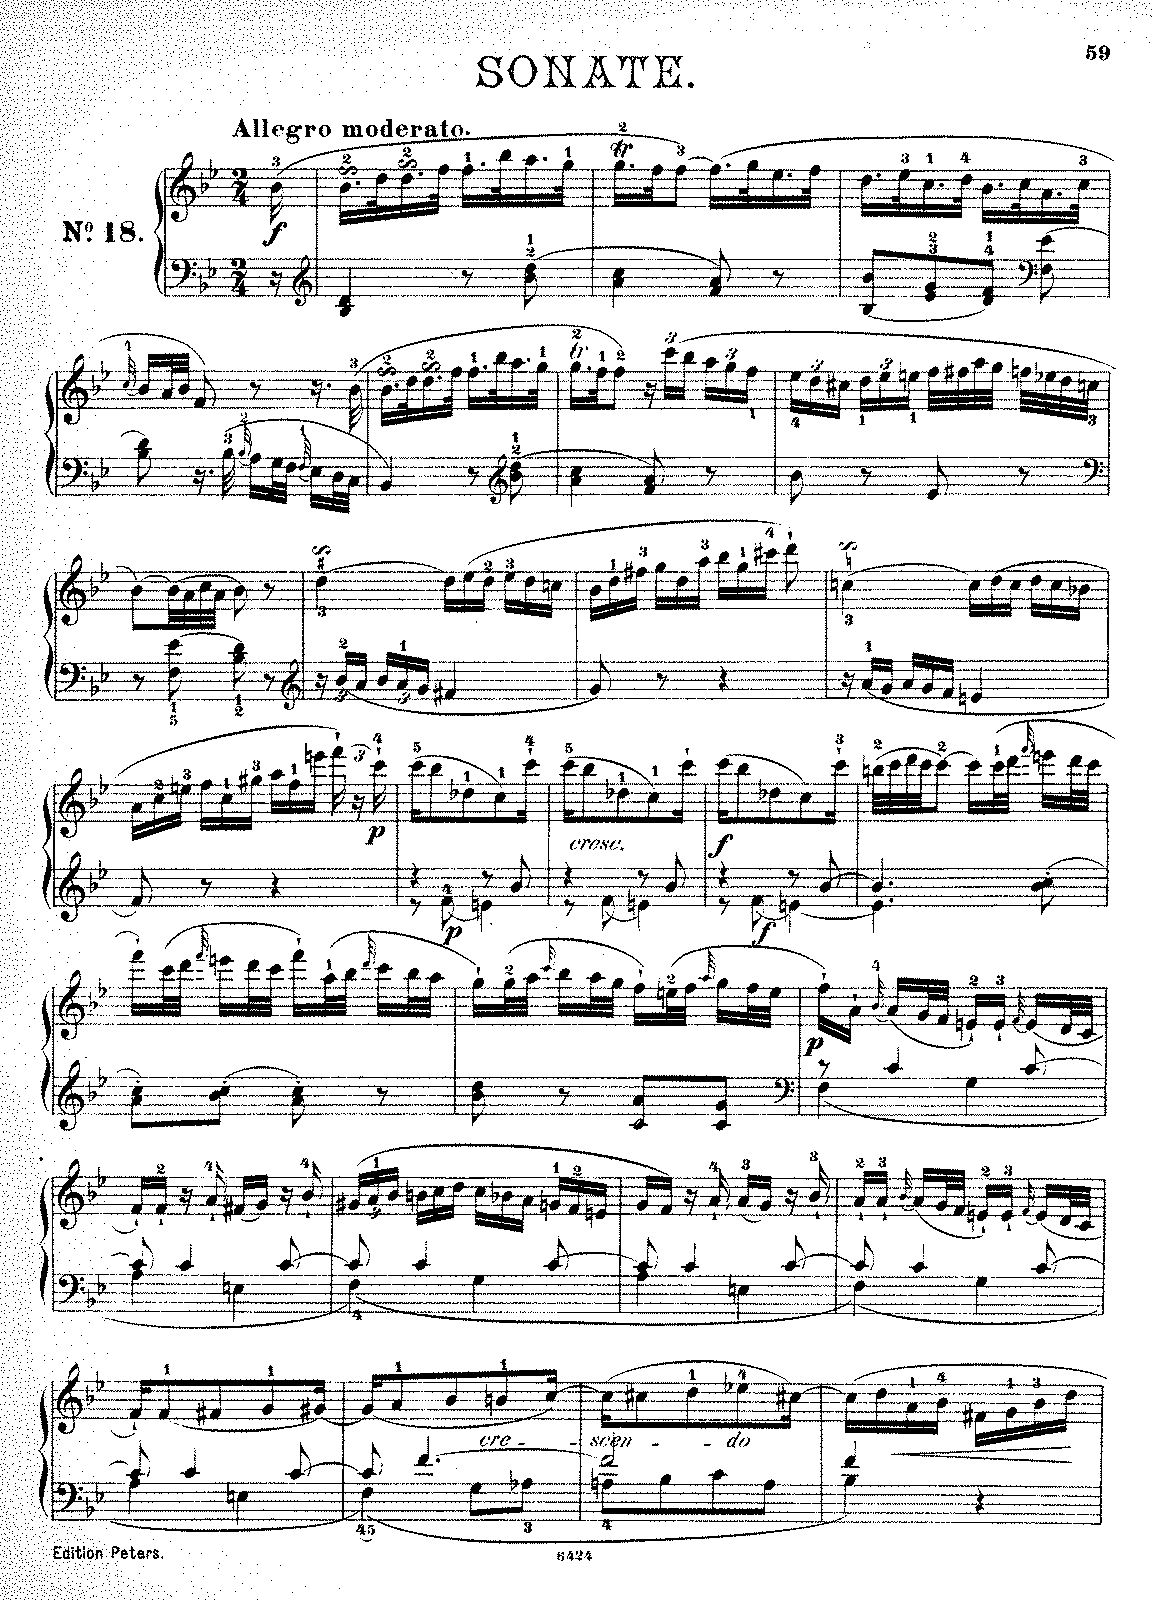 haydn piano sonata in b flat major analysis